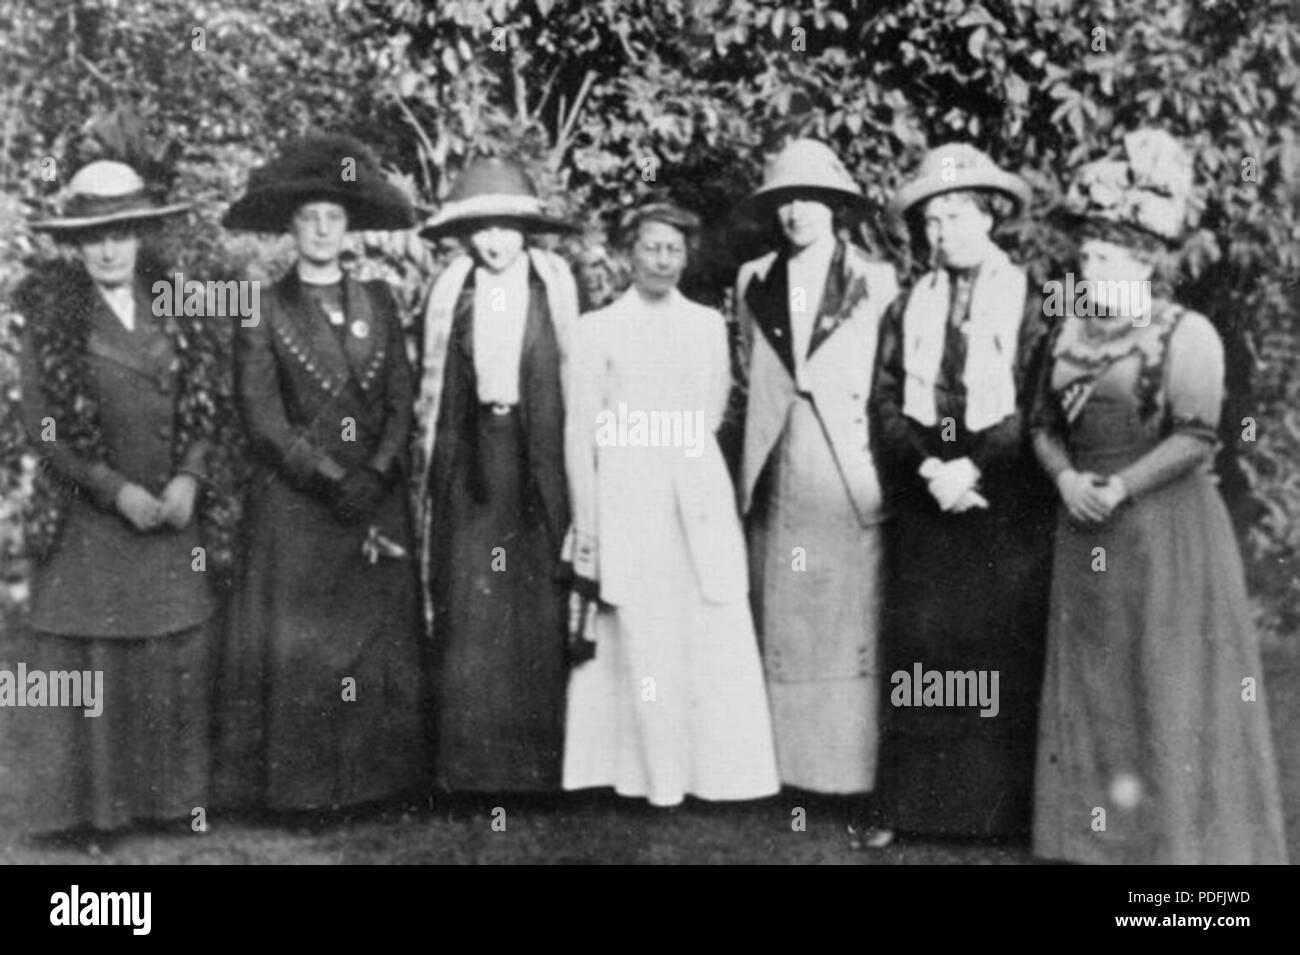 151 Helen Crawfurd, Janet Barrowman, Margaret McPhun, onorevole A.A. Wilson, Frances McPhun, Nancy A. John e Annie Swan Foto Stock